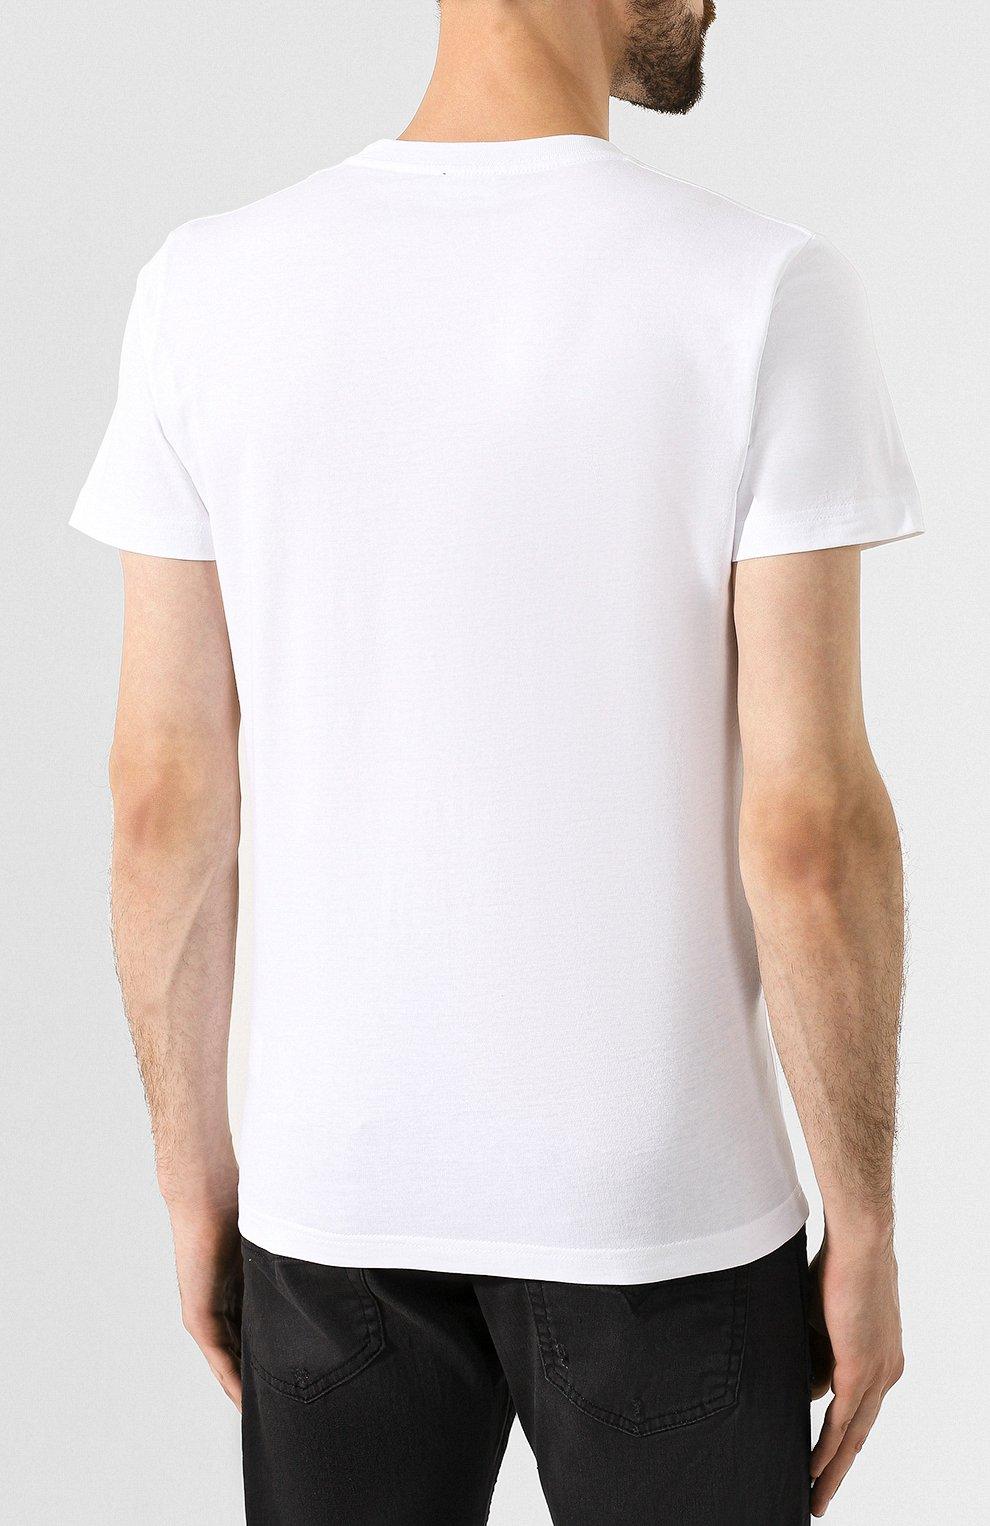 Хлопковая футболка Diesel белая   Фото №4